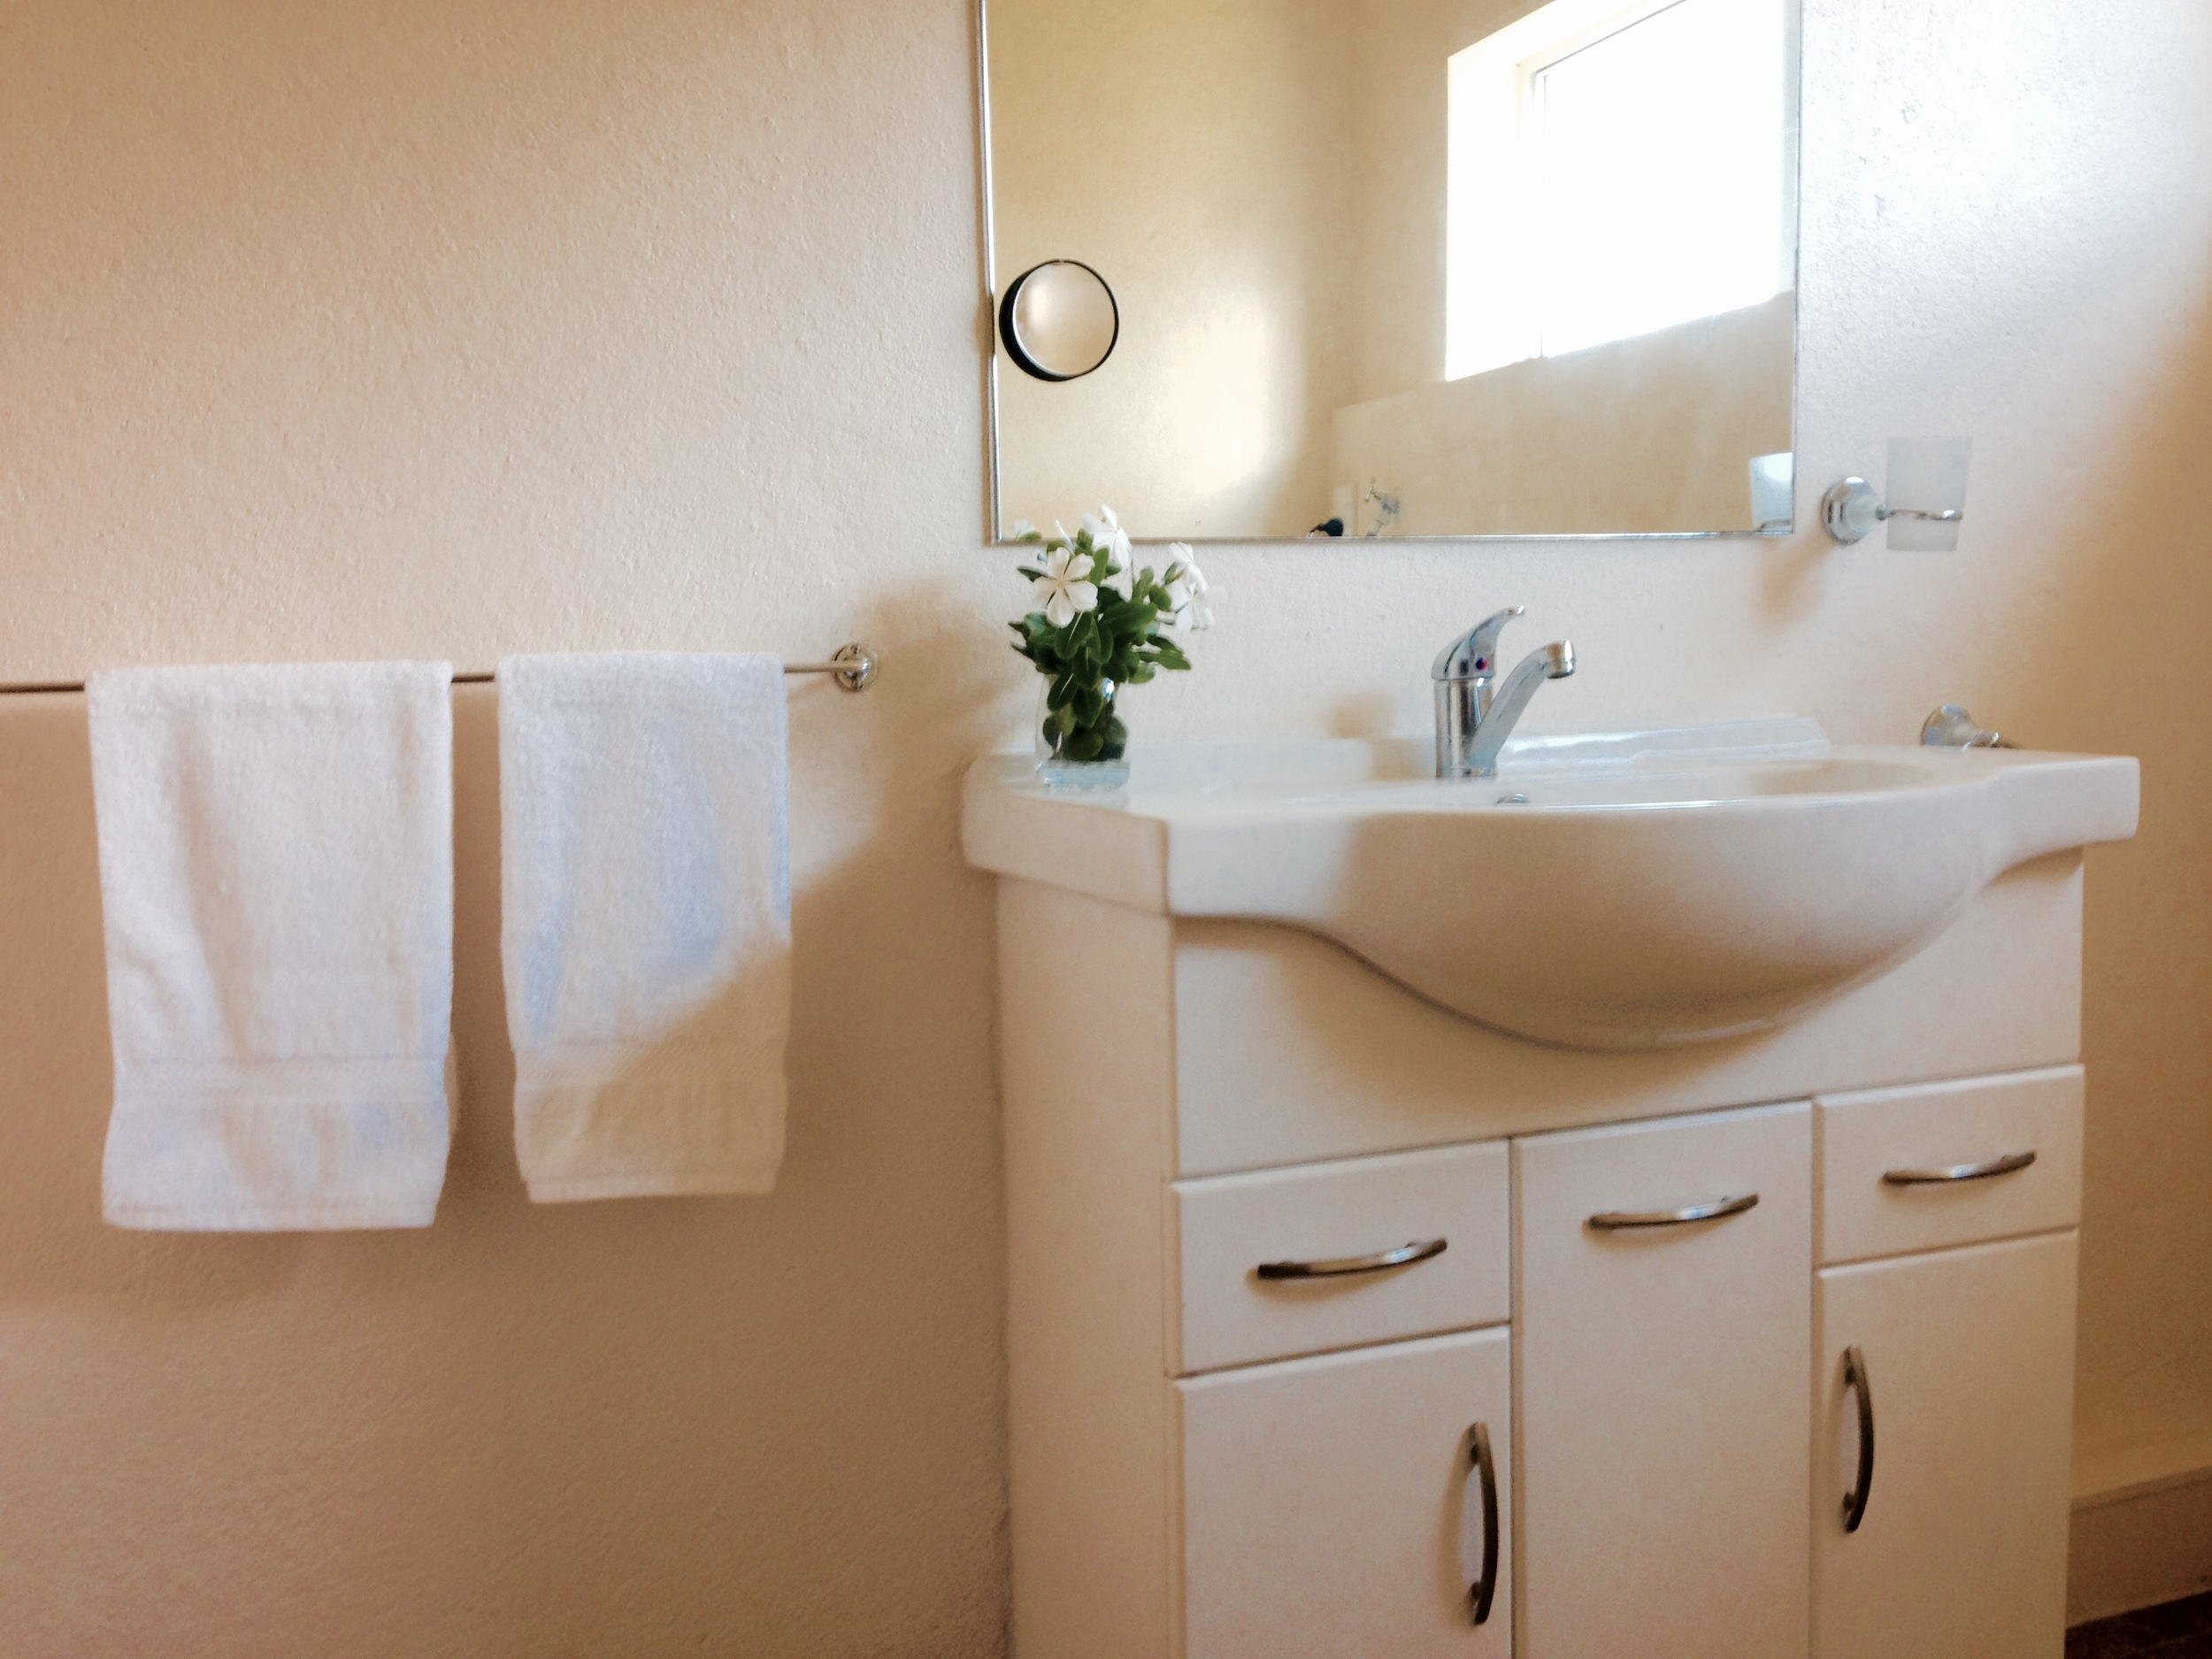 Villa bathroom 2 sink FS.jpg